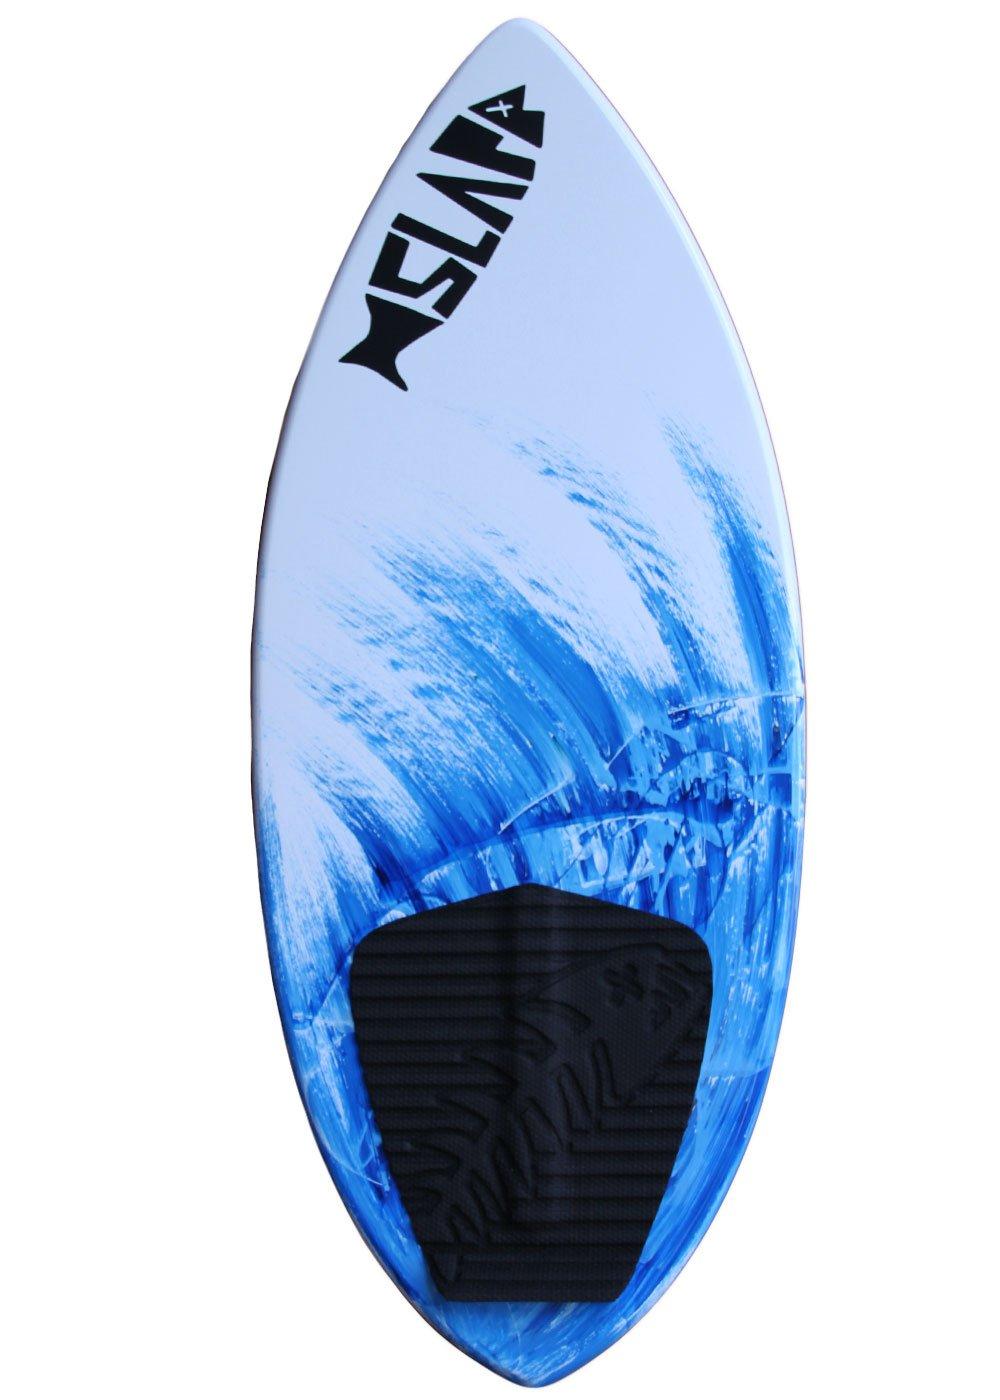 Slapfish Skimboards - Fiberglass & Carbon with Traction Deck Grip - Kids & Adults - 2 Sizes - Blue (41'' Board)